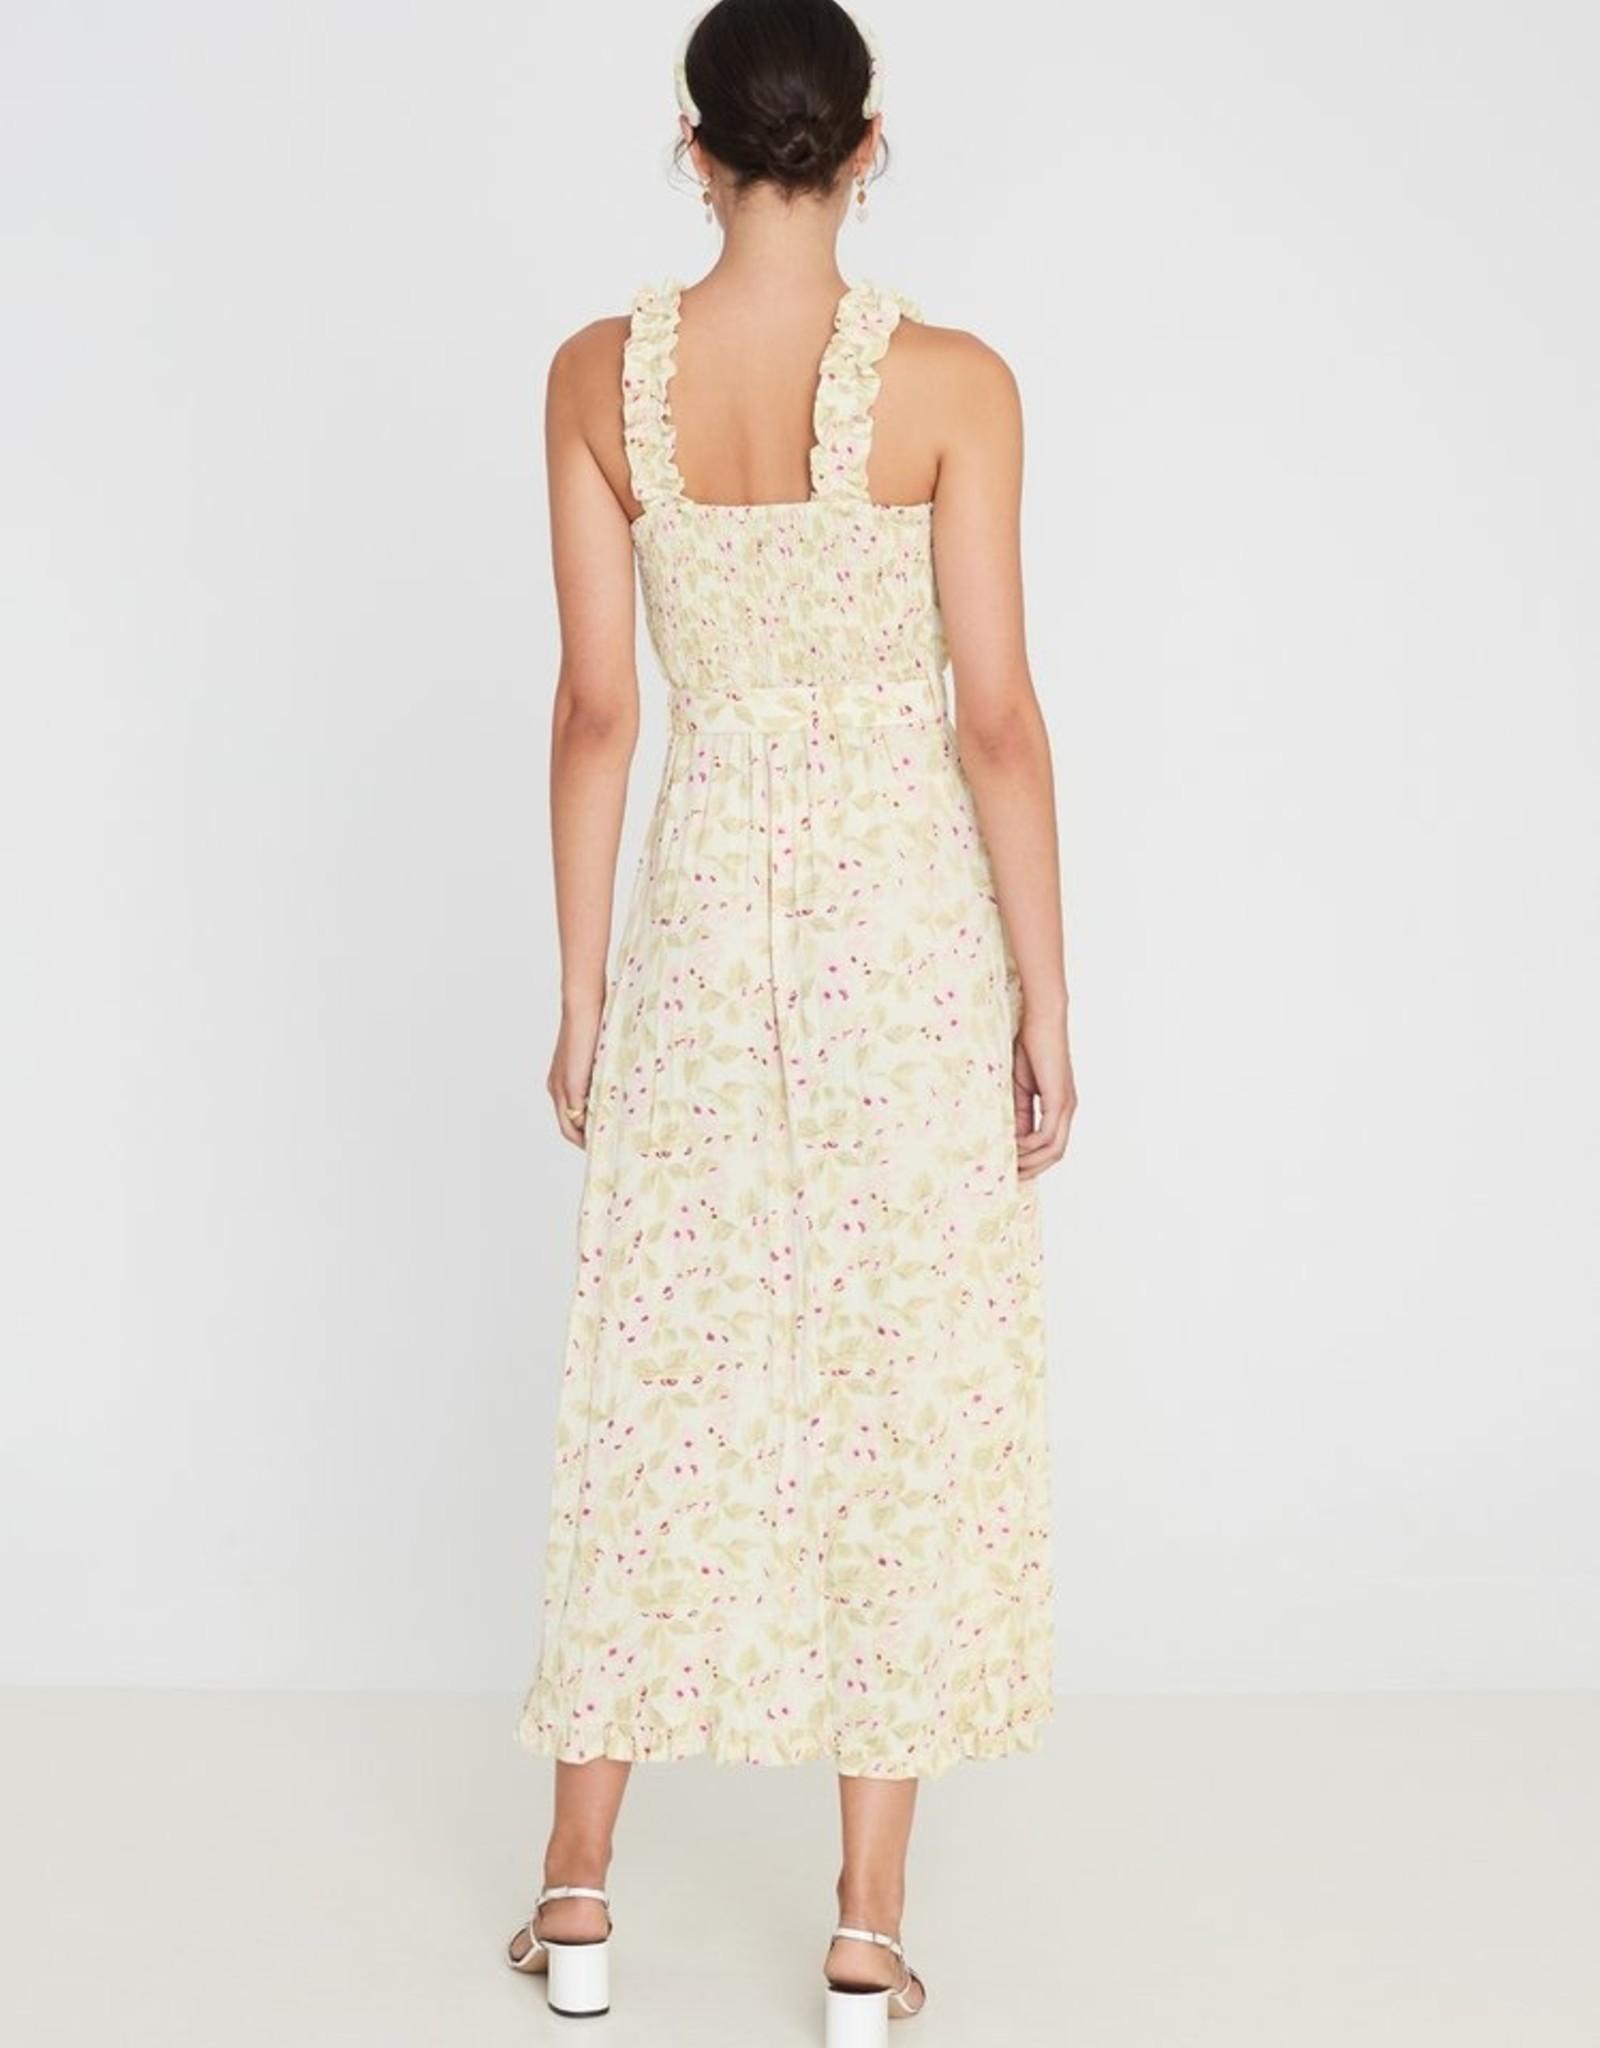 Faithfull the Brand Saint Tropez Midi Dress